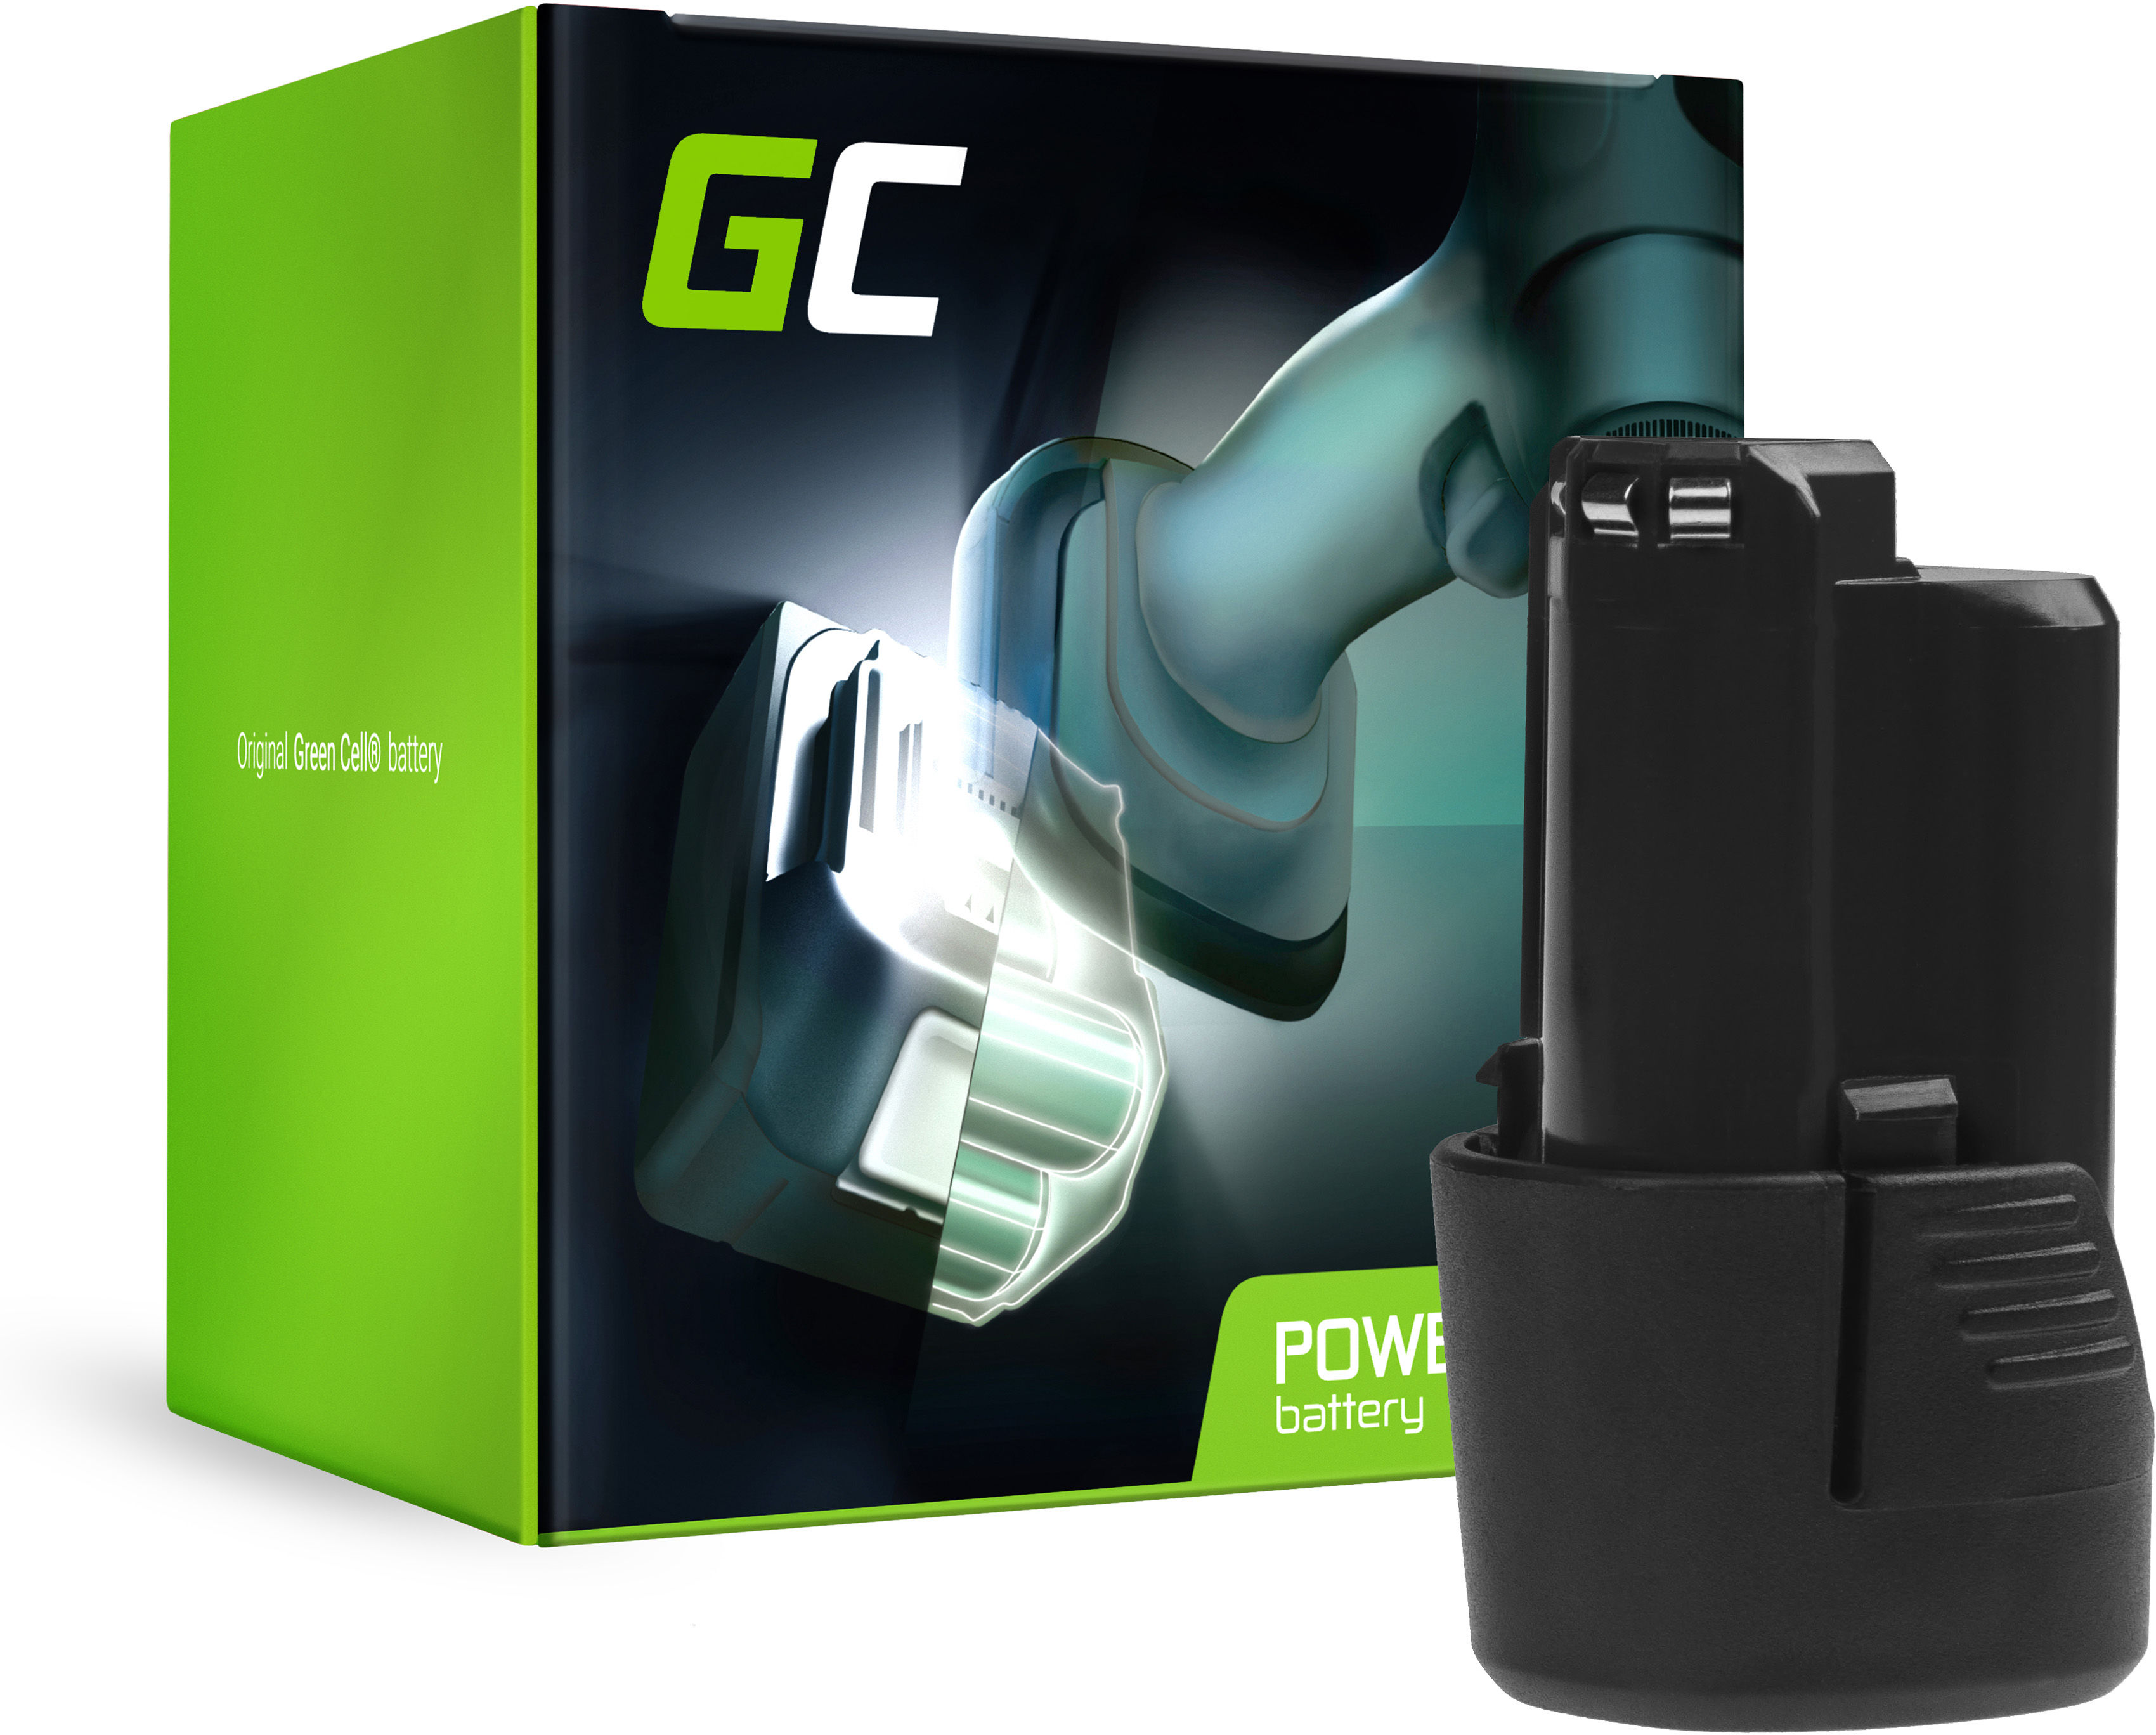 Bateria Green Cell (2Ah 10.8V) GBA 12V 2607336333 D-70745 2607336013 BAT414 do Bosch GAS GLI GSR 10.8V-LI 10.8V-LI